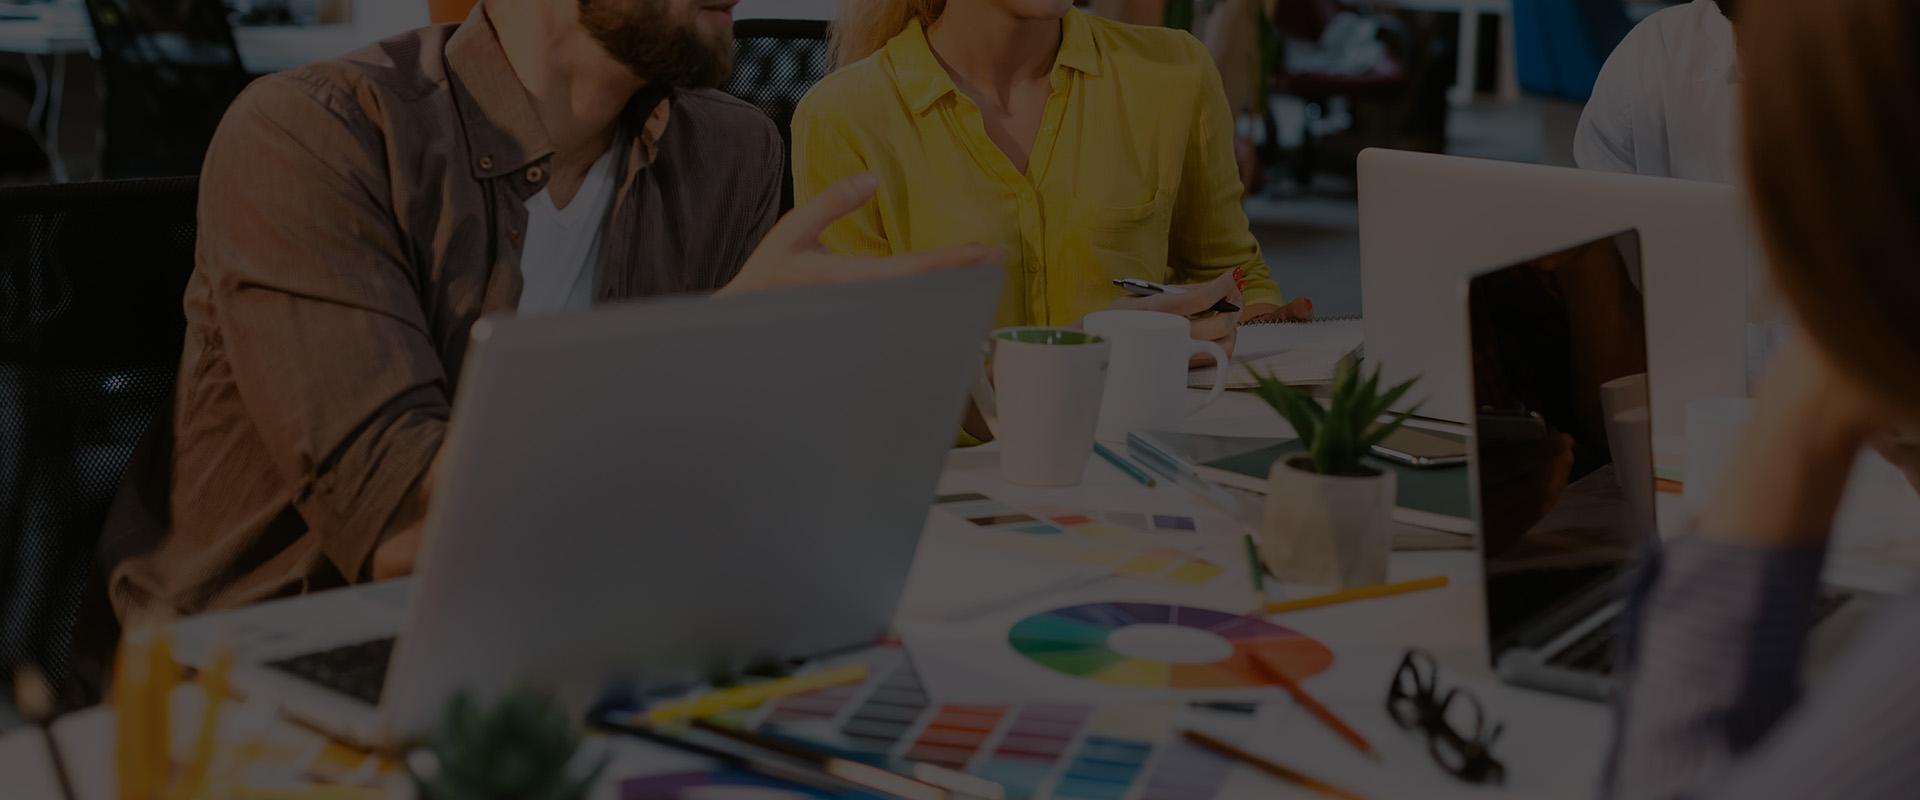 web agency brand image